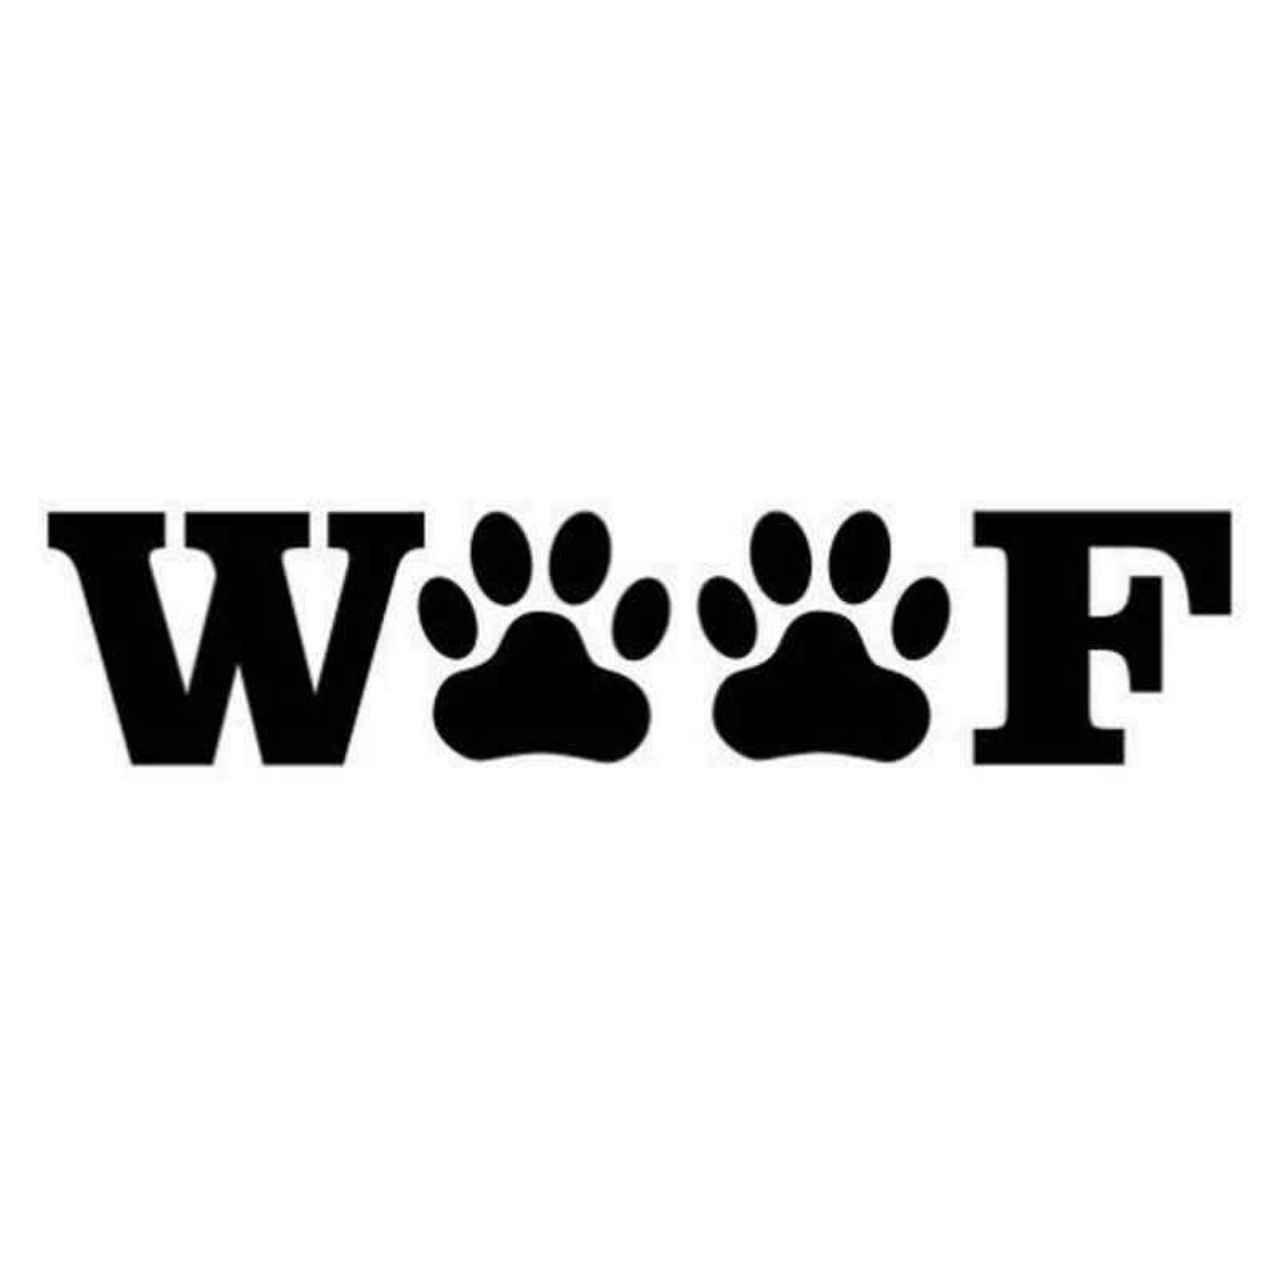 Wolf 41 Decal Sticker Ballzbeatz Com Dog Quotes Dogs Vinyl Decals [ 1280 x 1280 Pixel ]